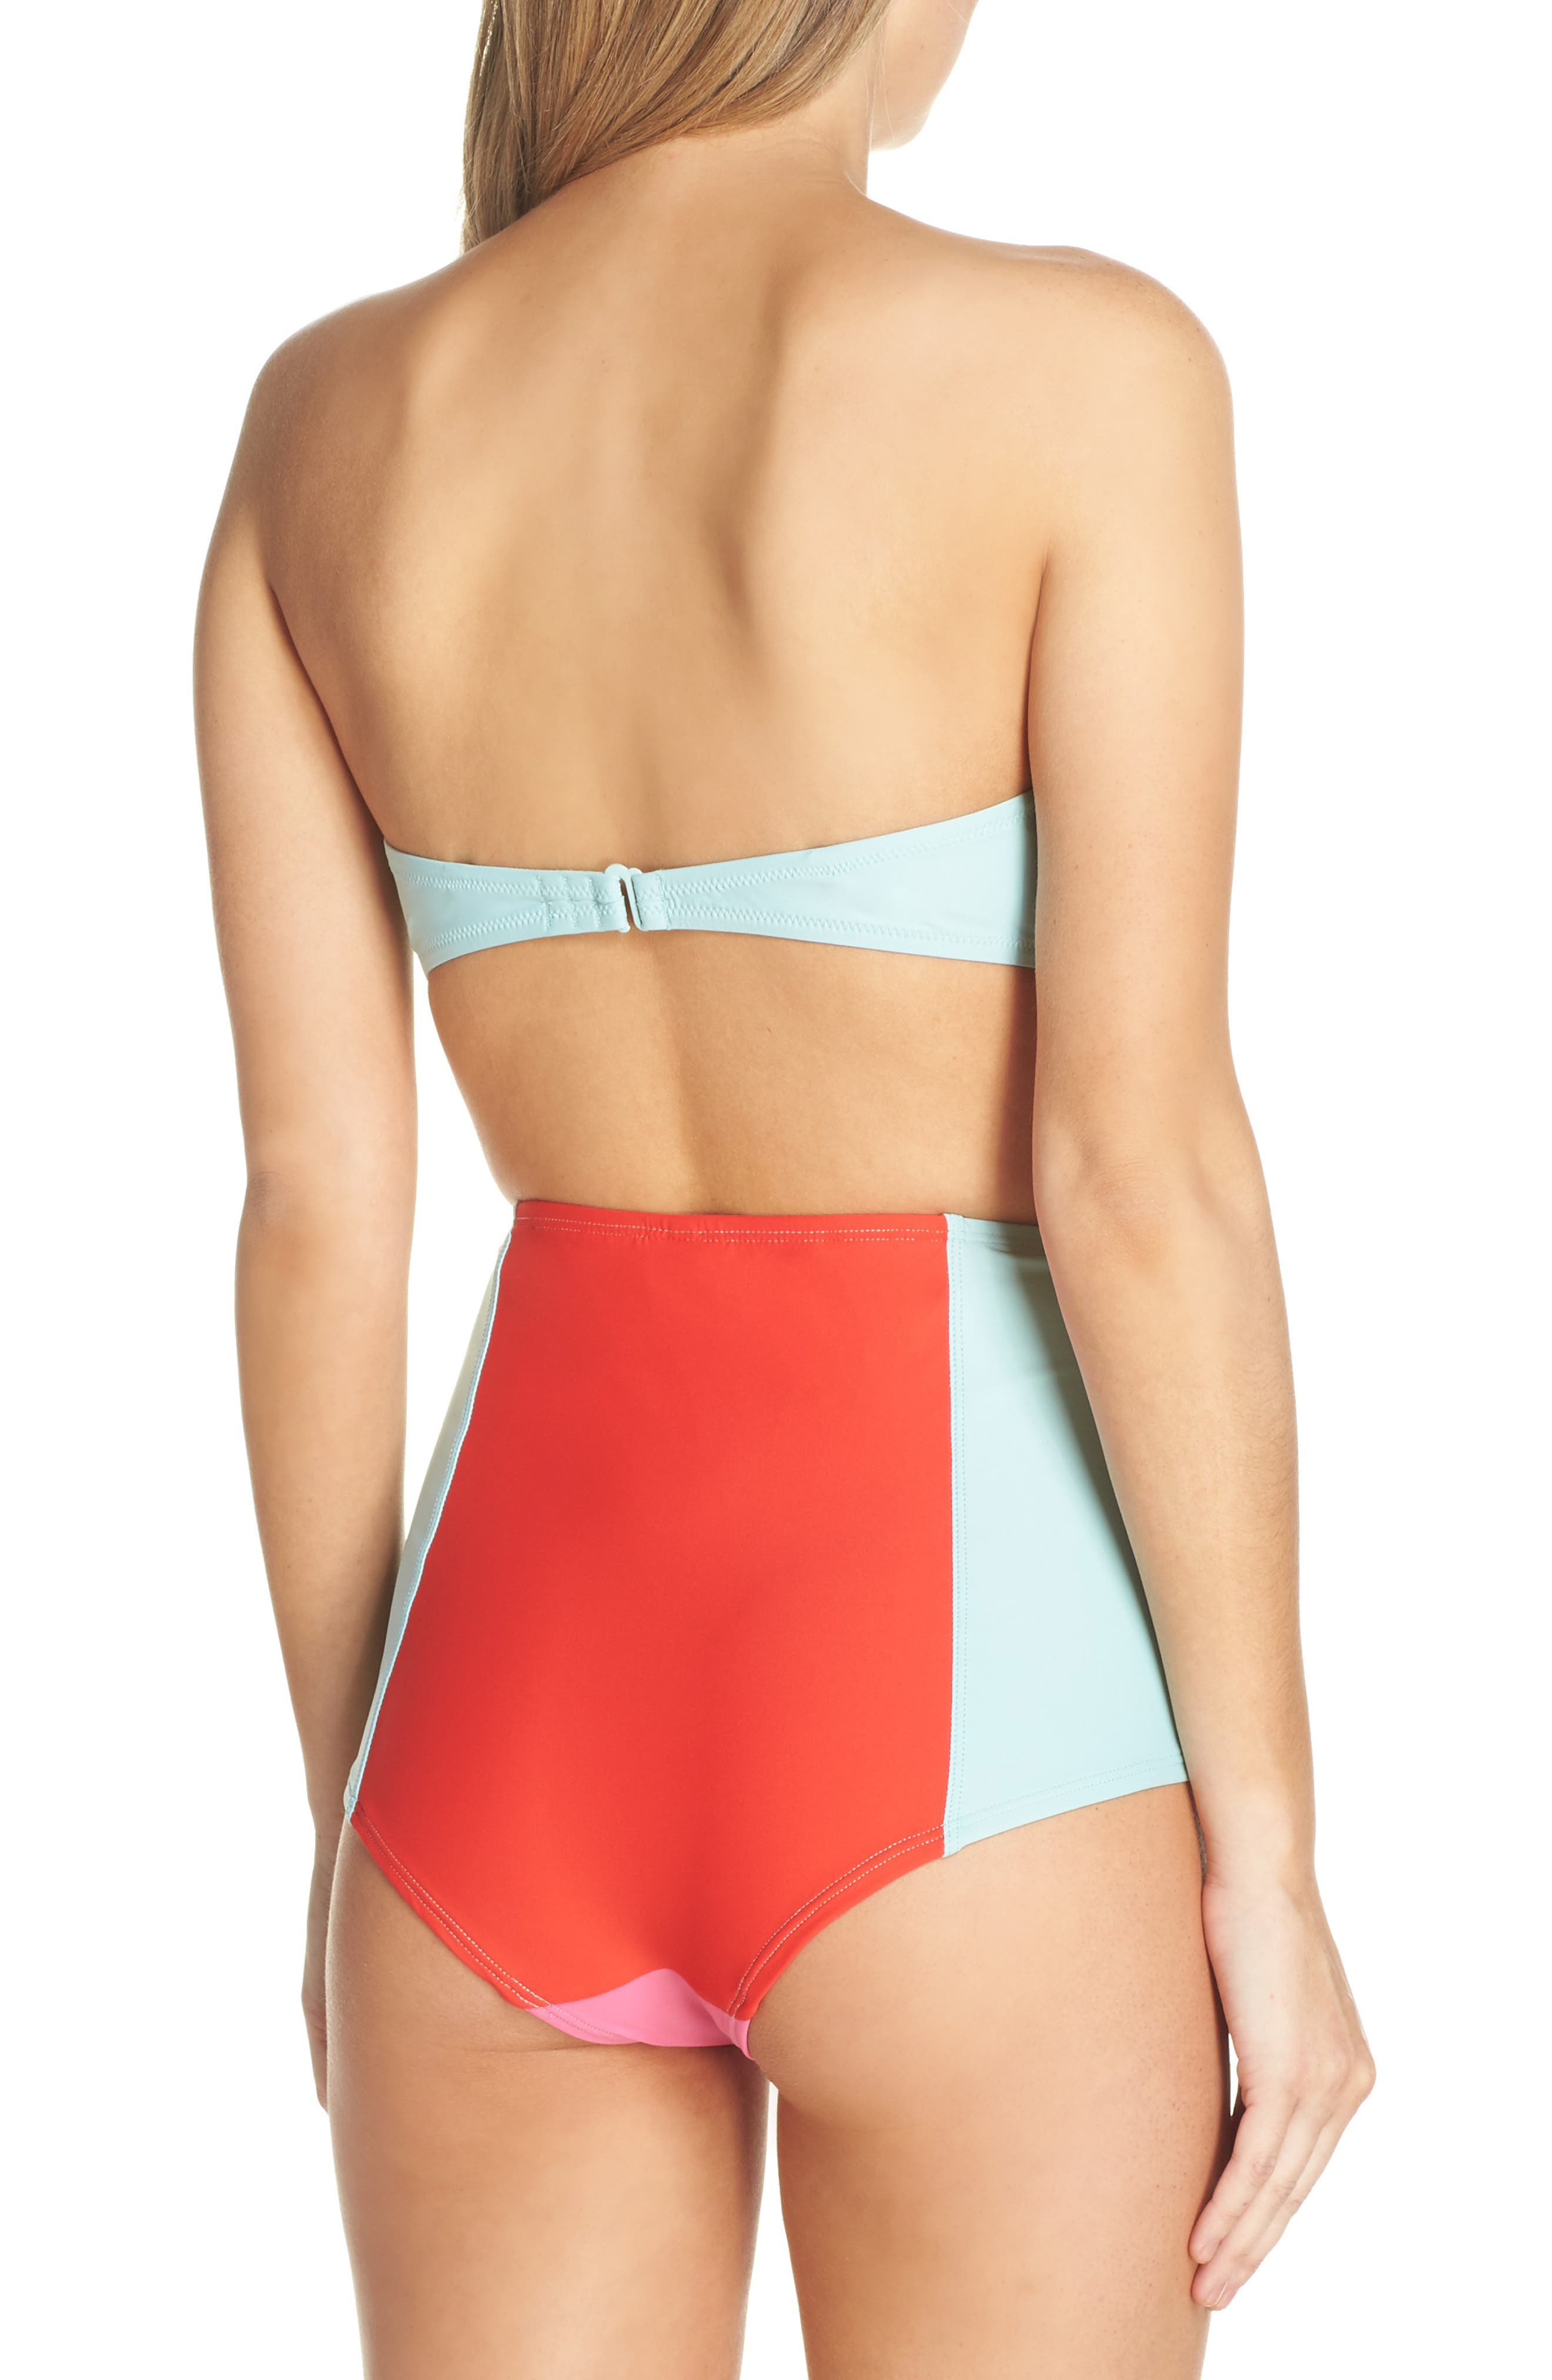 Colorblock Underwire Bikini Top,                             Alternate thumbnail 9, color,                             MINT CERISE PINK